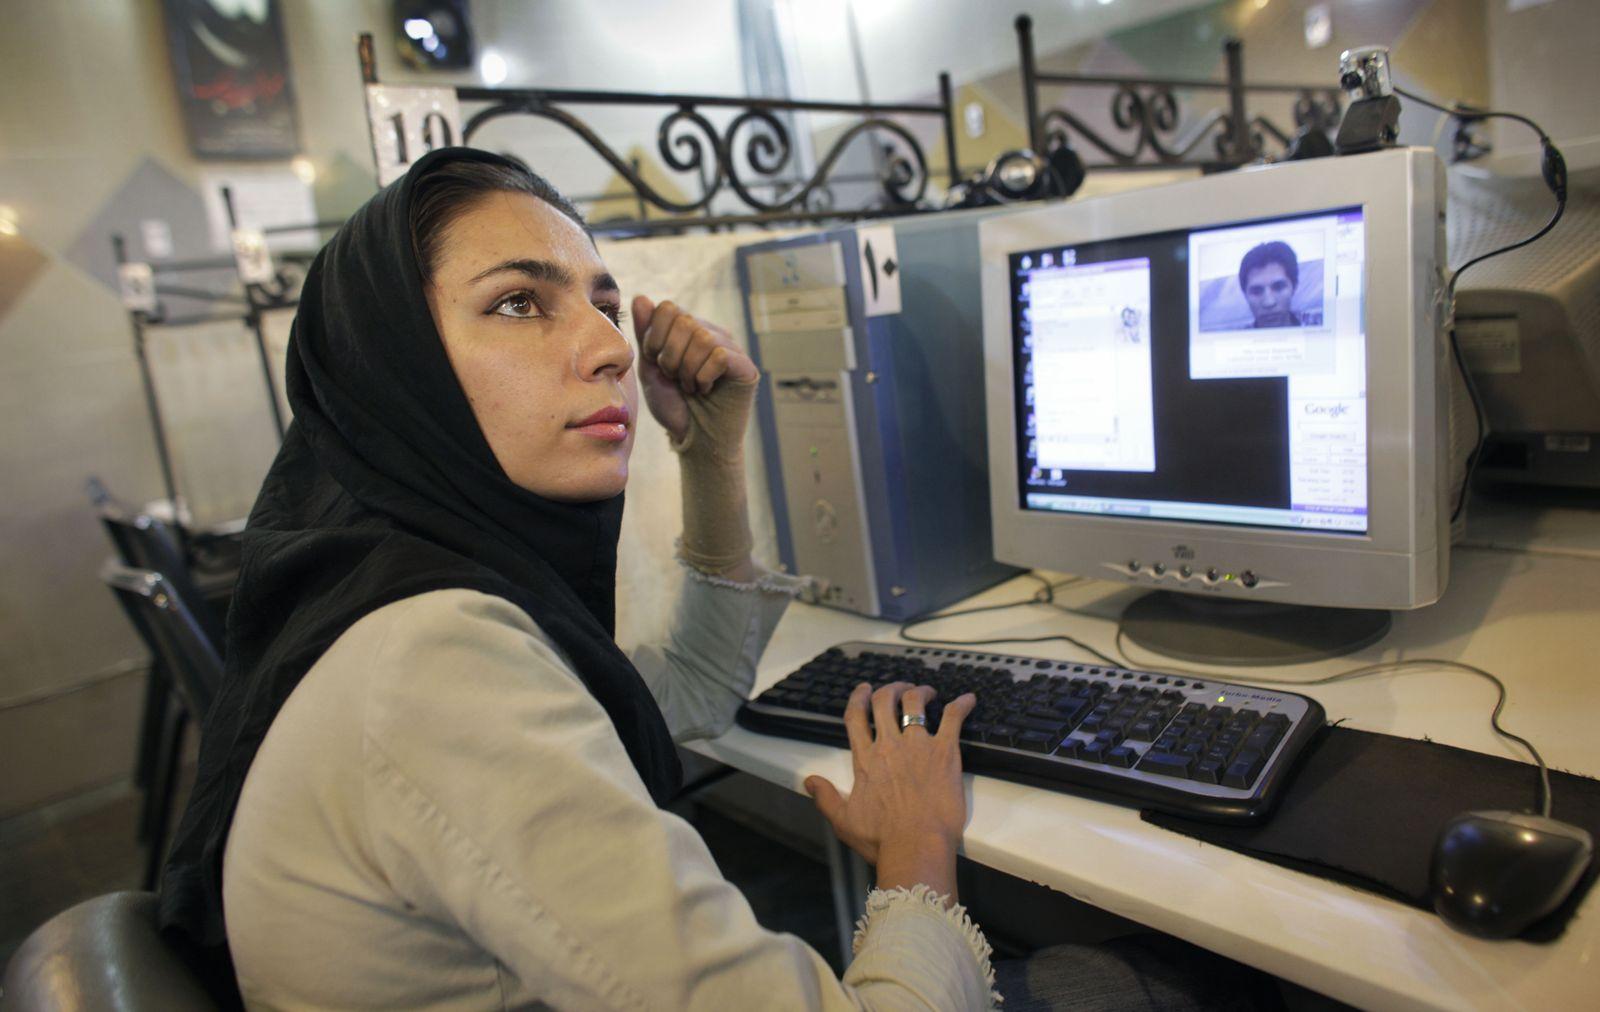 Iran Internetcafe